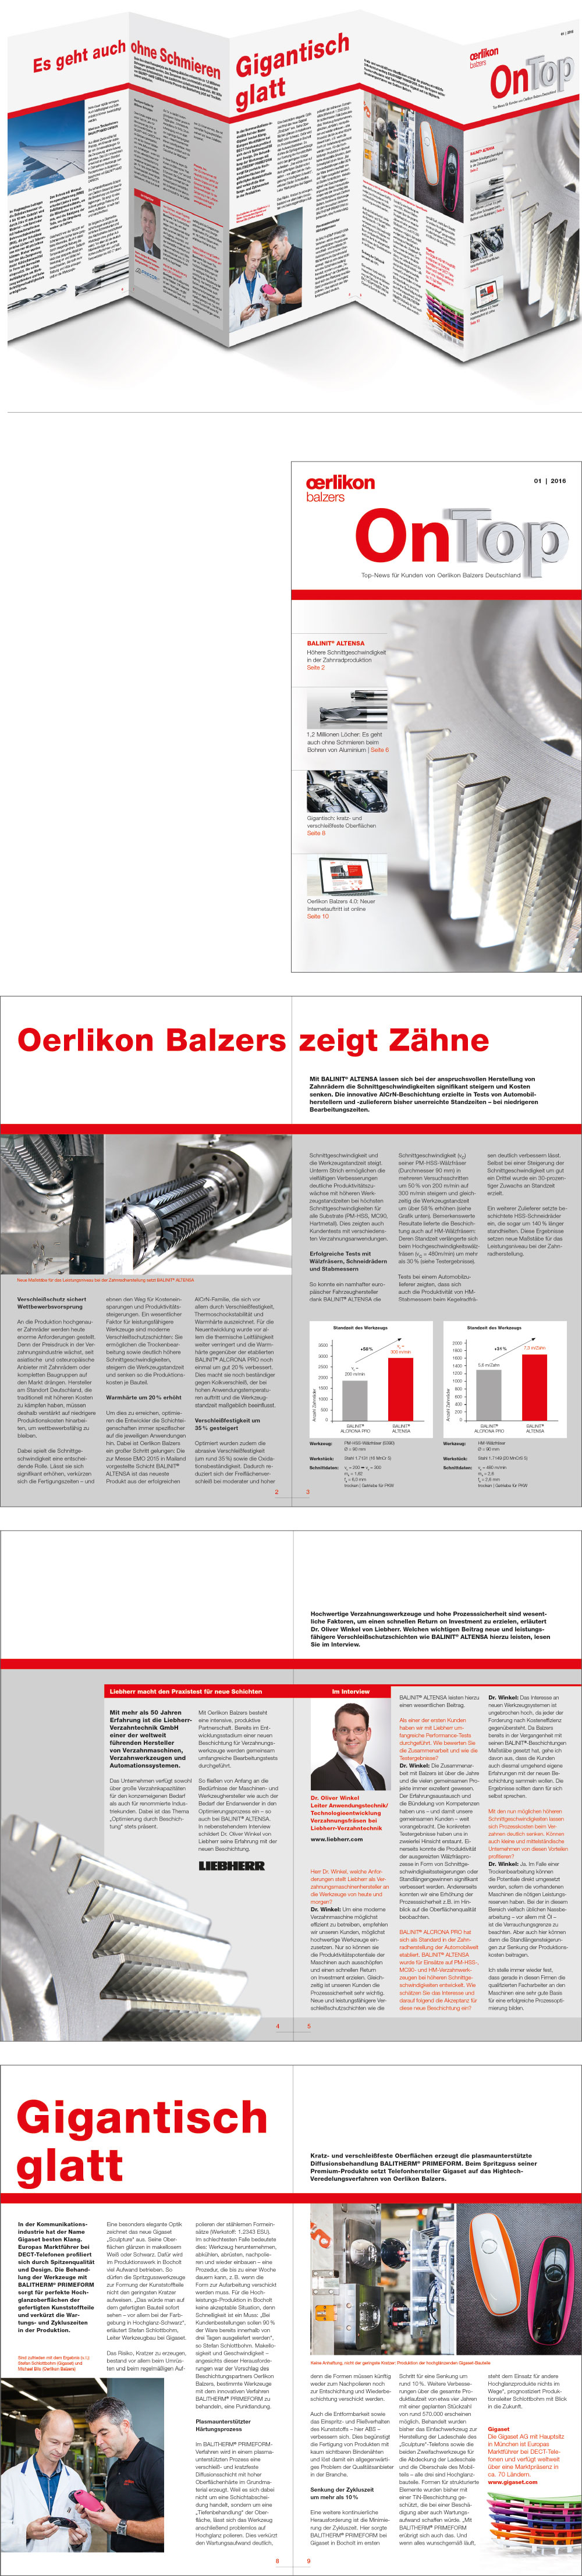 oerlikon balzers Newsletter onTop